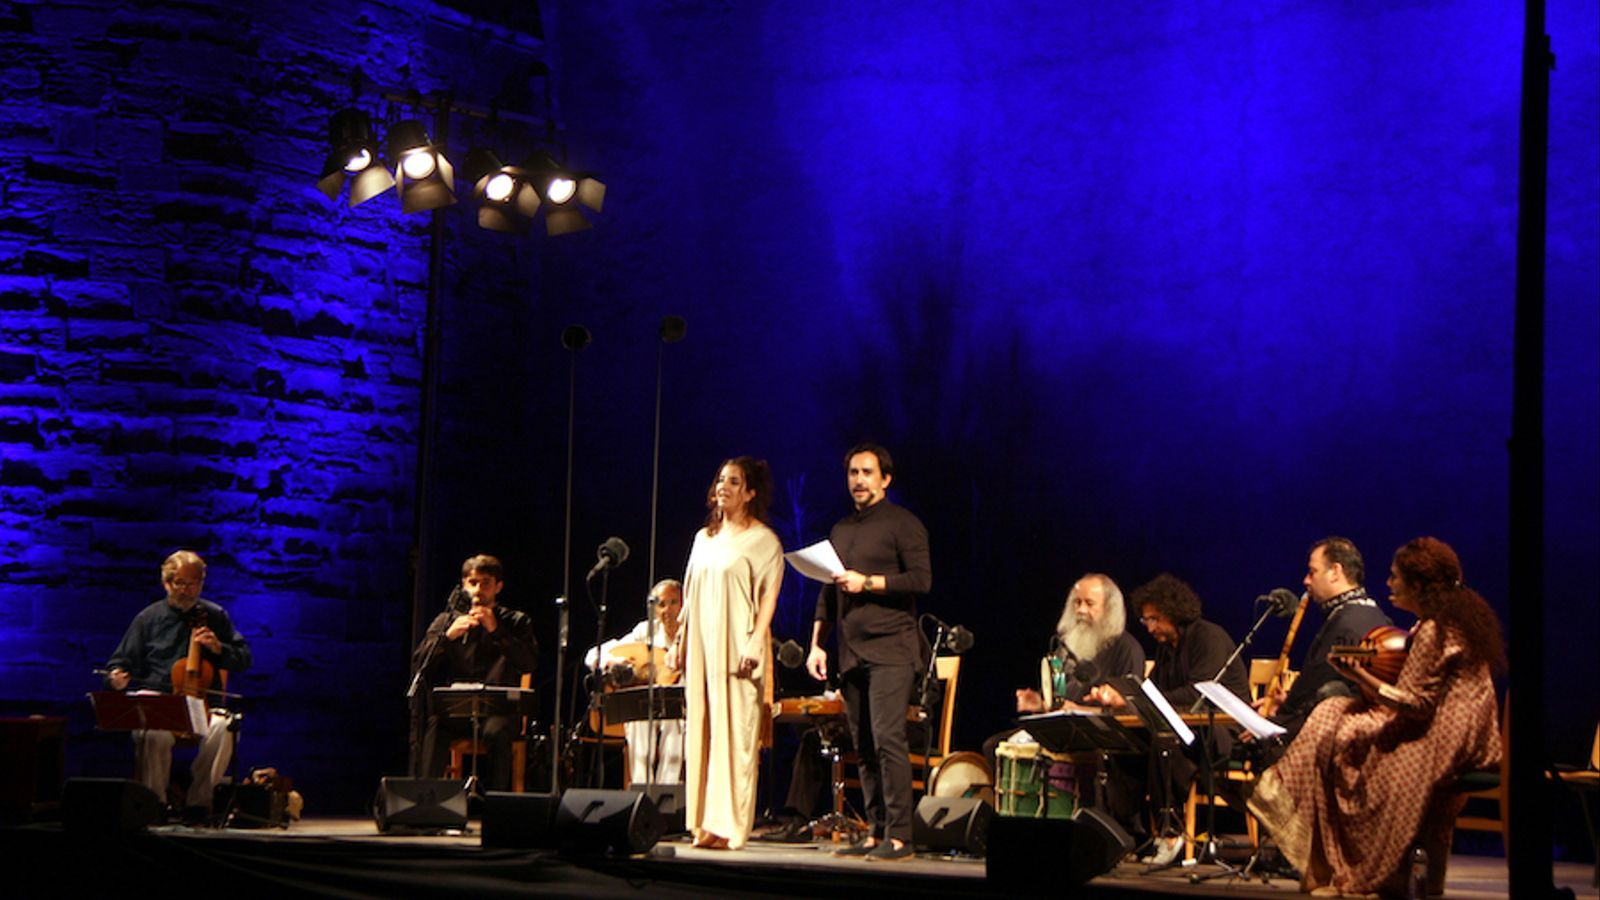 Jordi Savall - Hespèrion XX - España Antigua